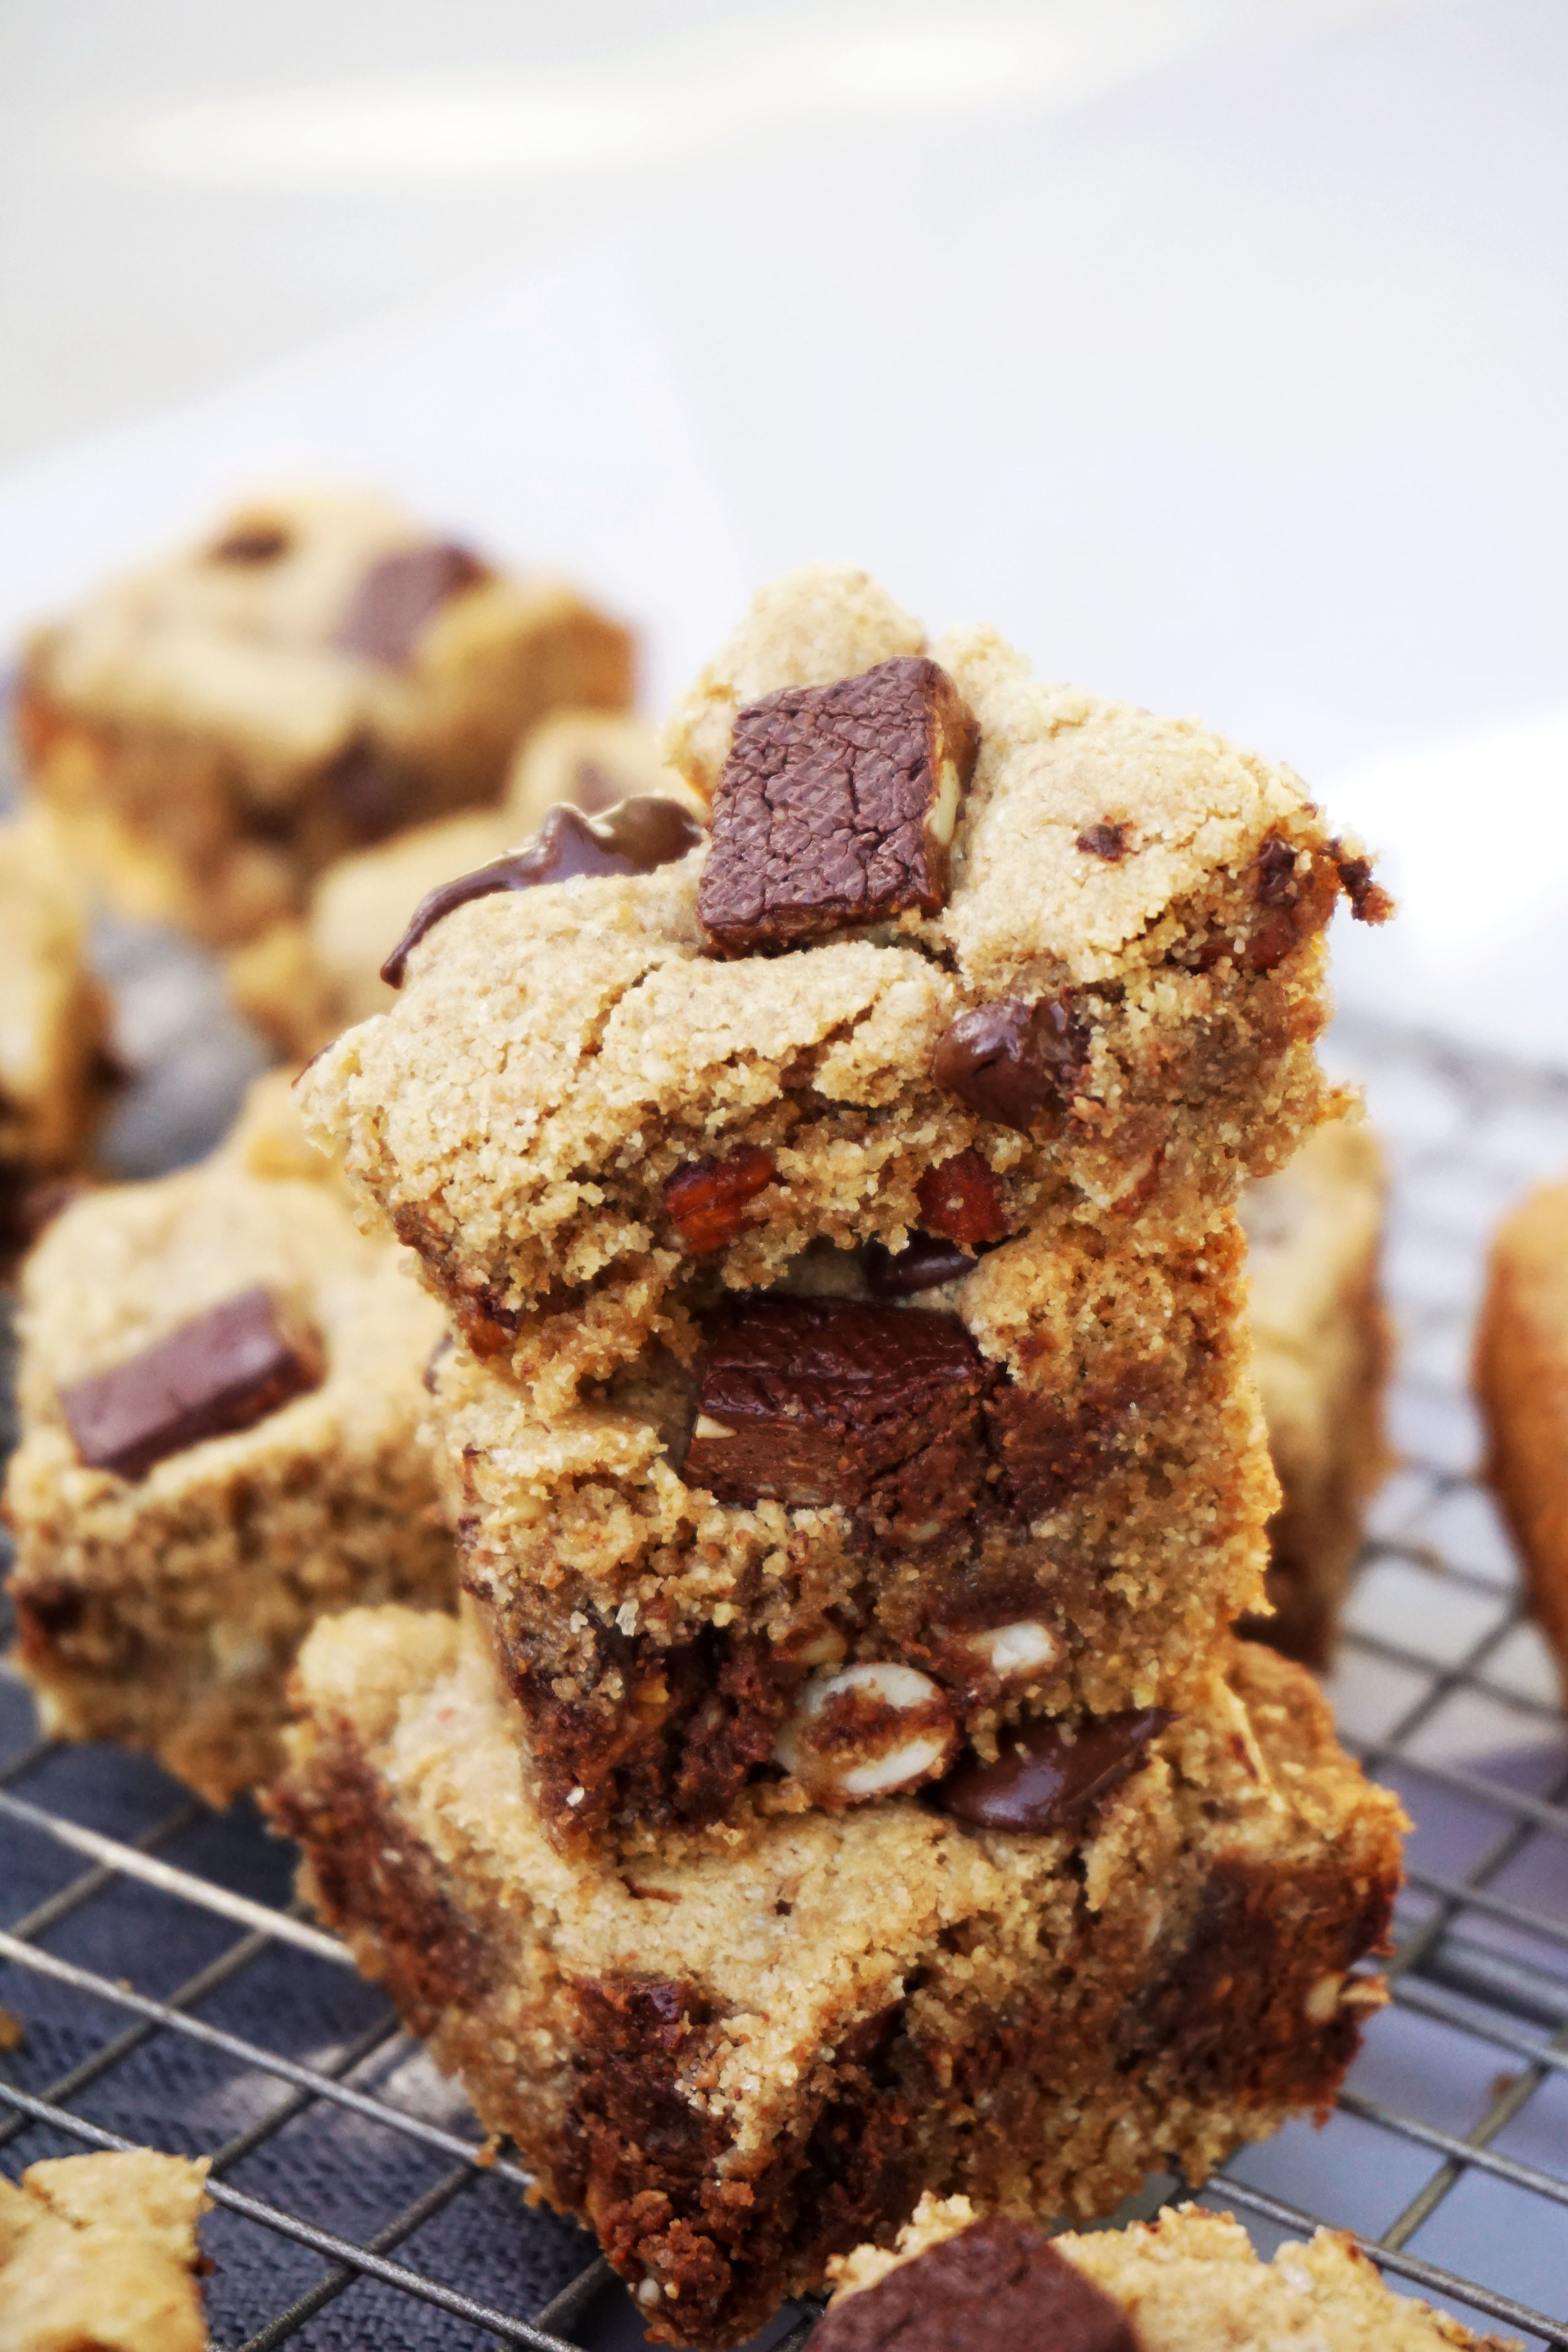 The Chocolate-Bar Cookie Bar